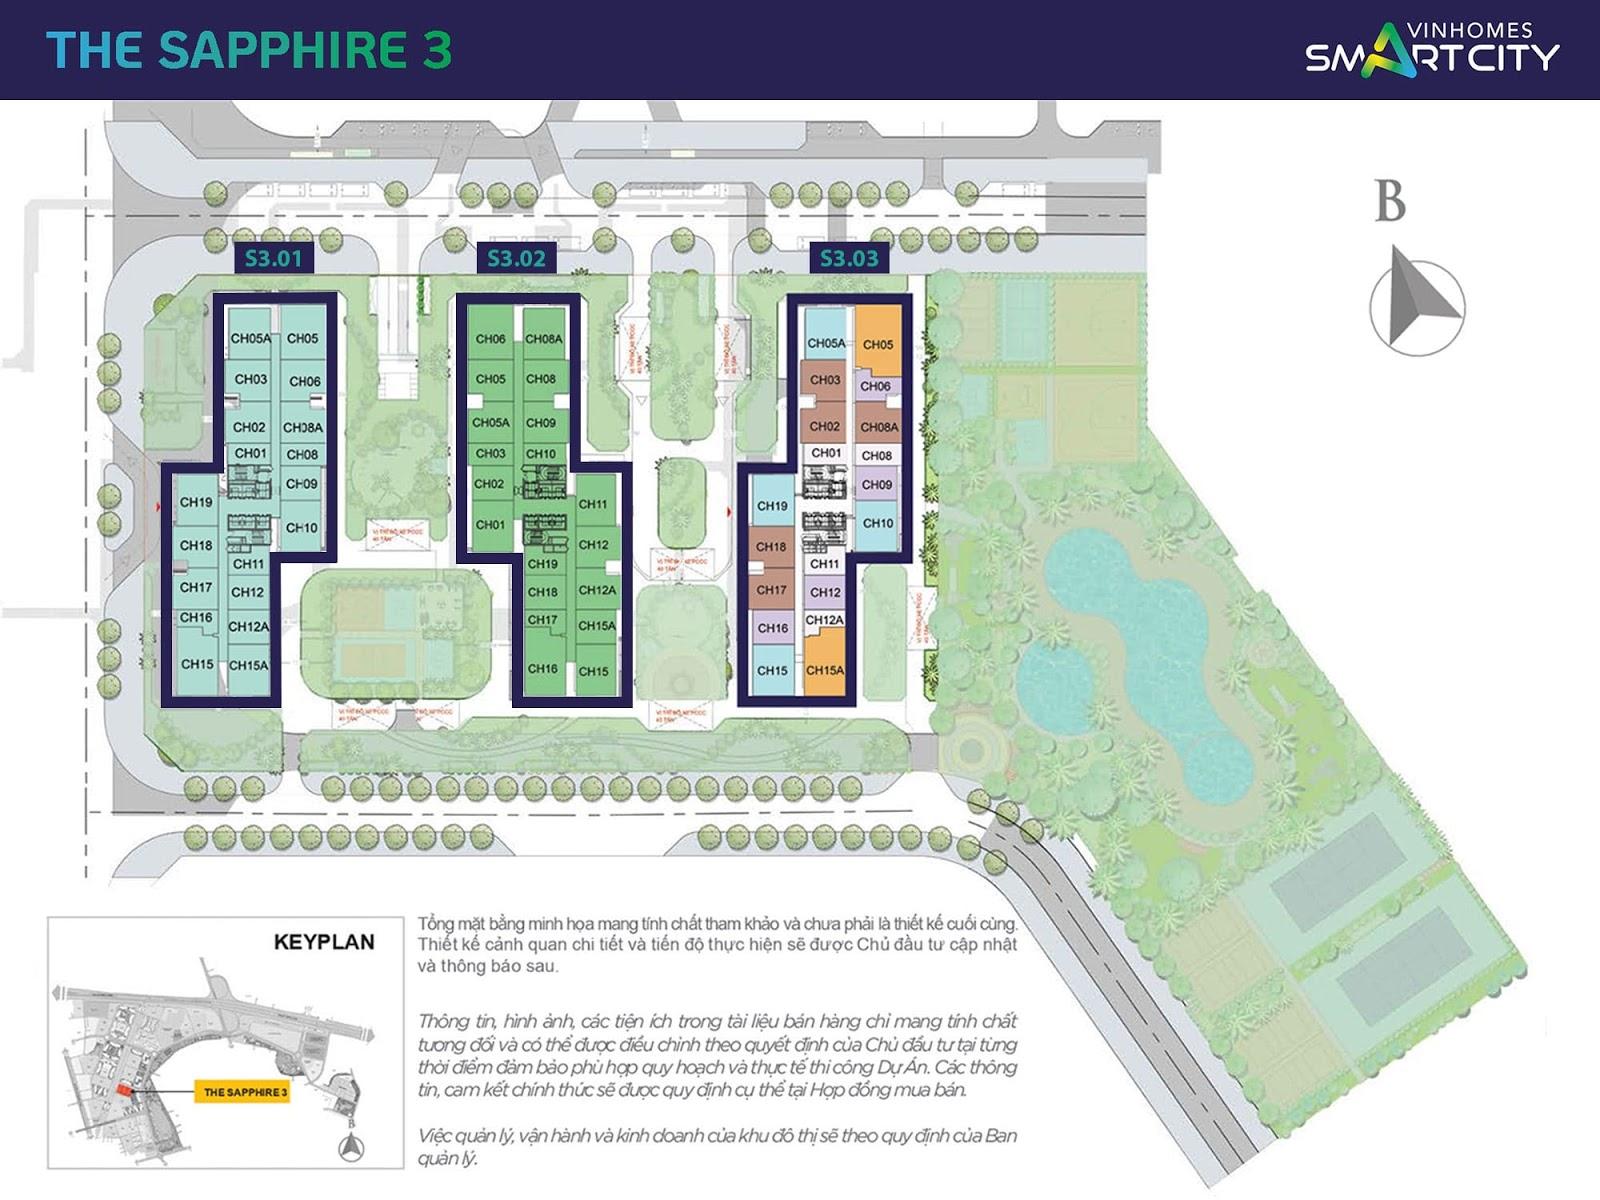 mat bang khu the shapphire 3 vinhomes smart city